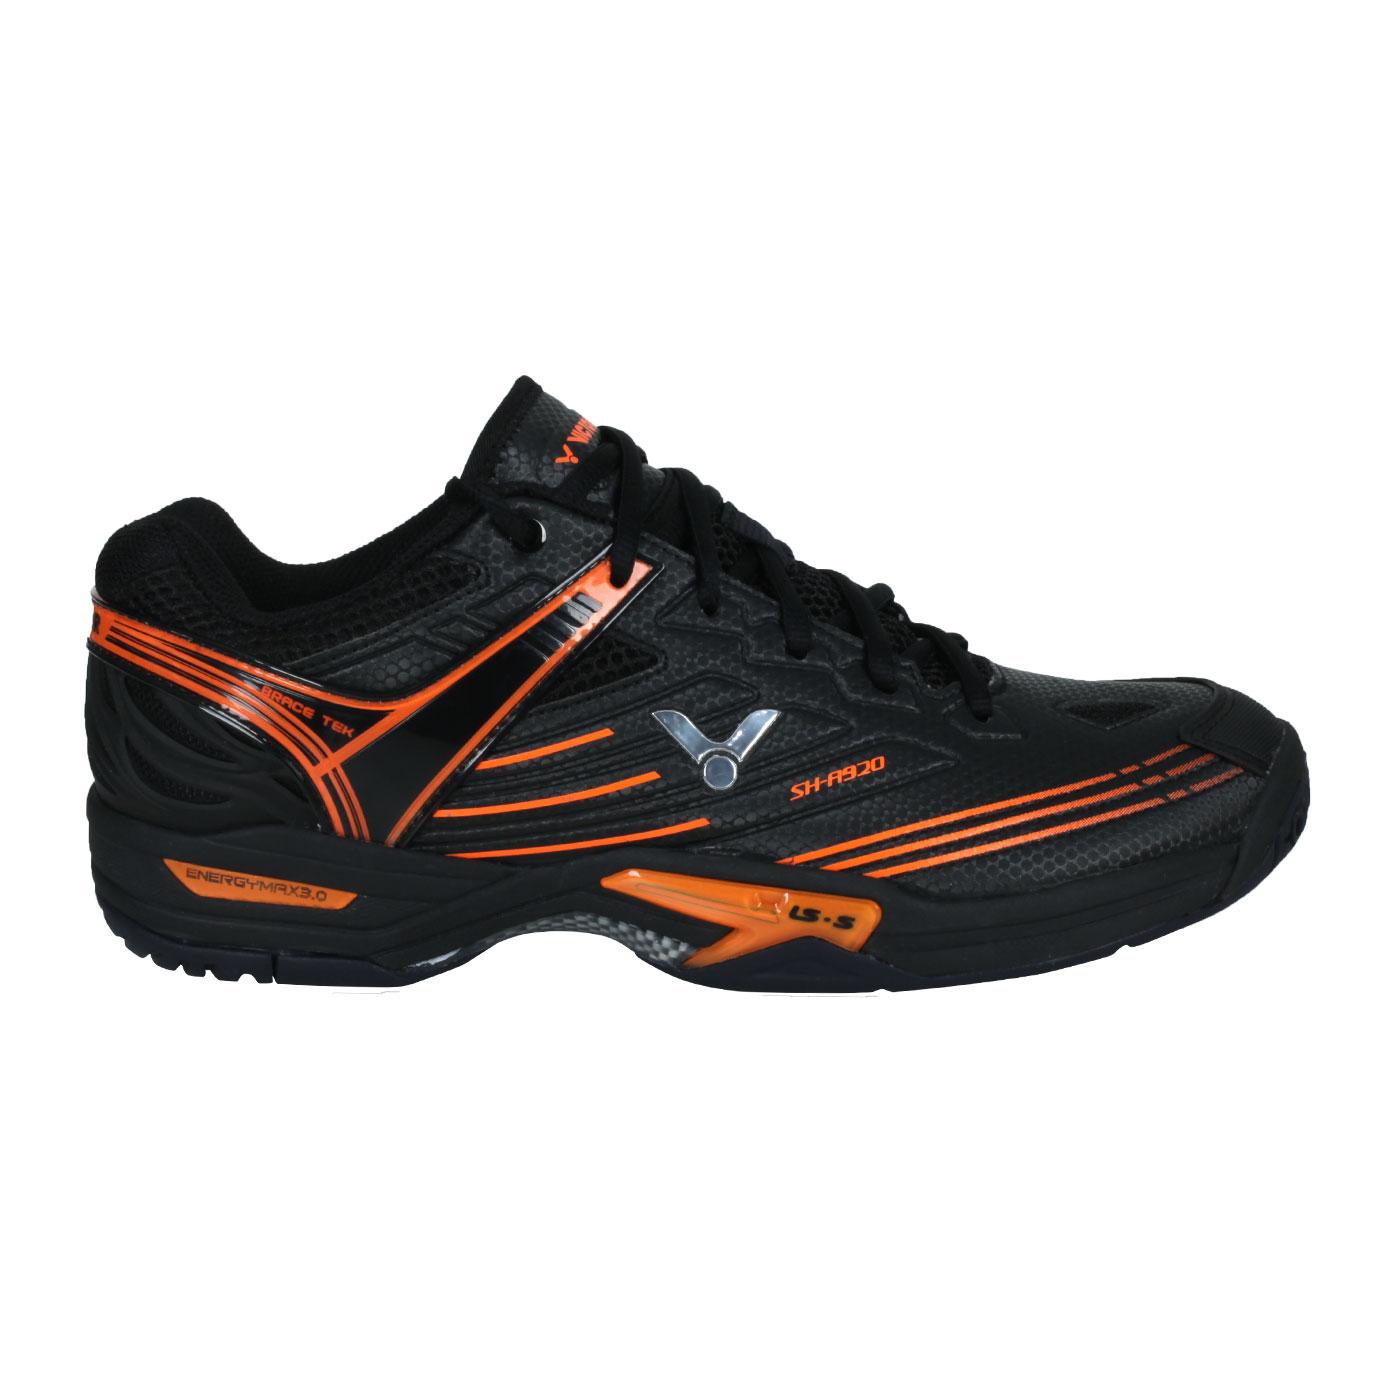 VICTOR 男款羽球鞋 SH-A920-C